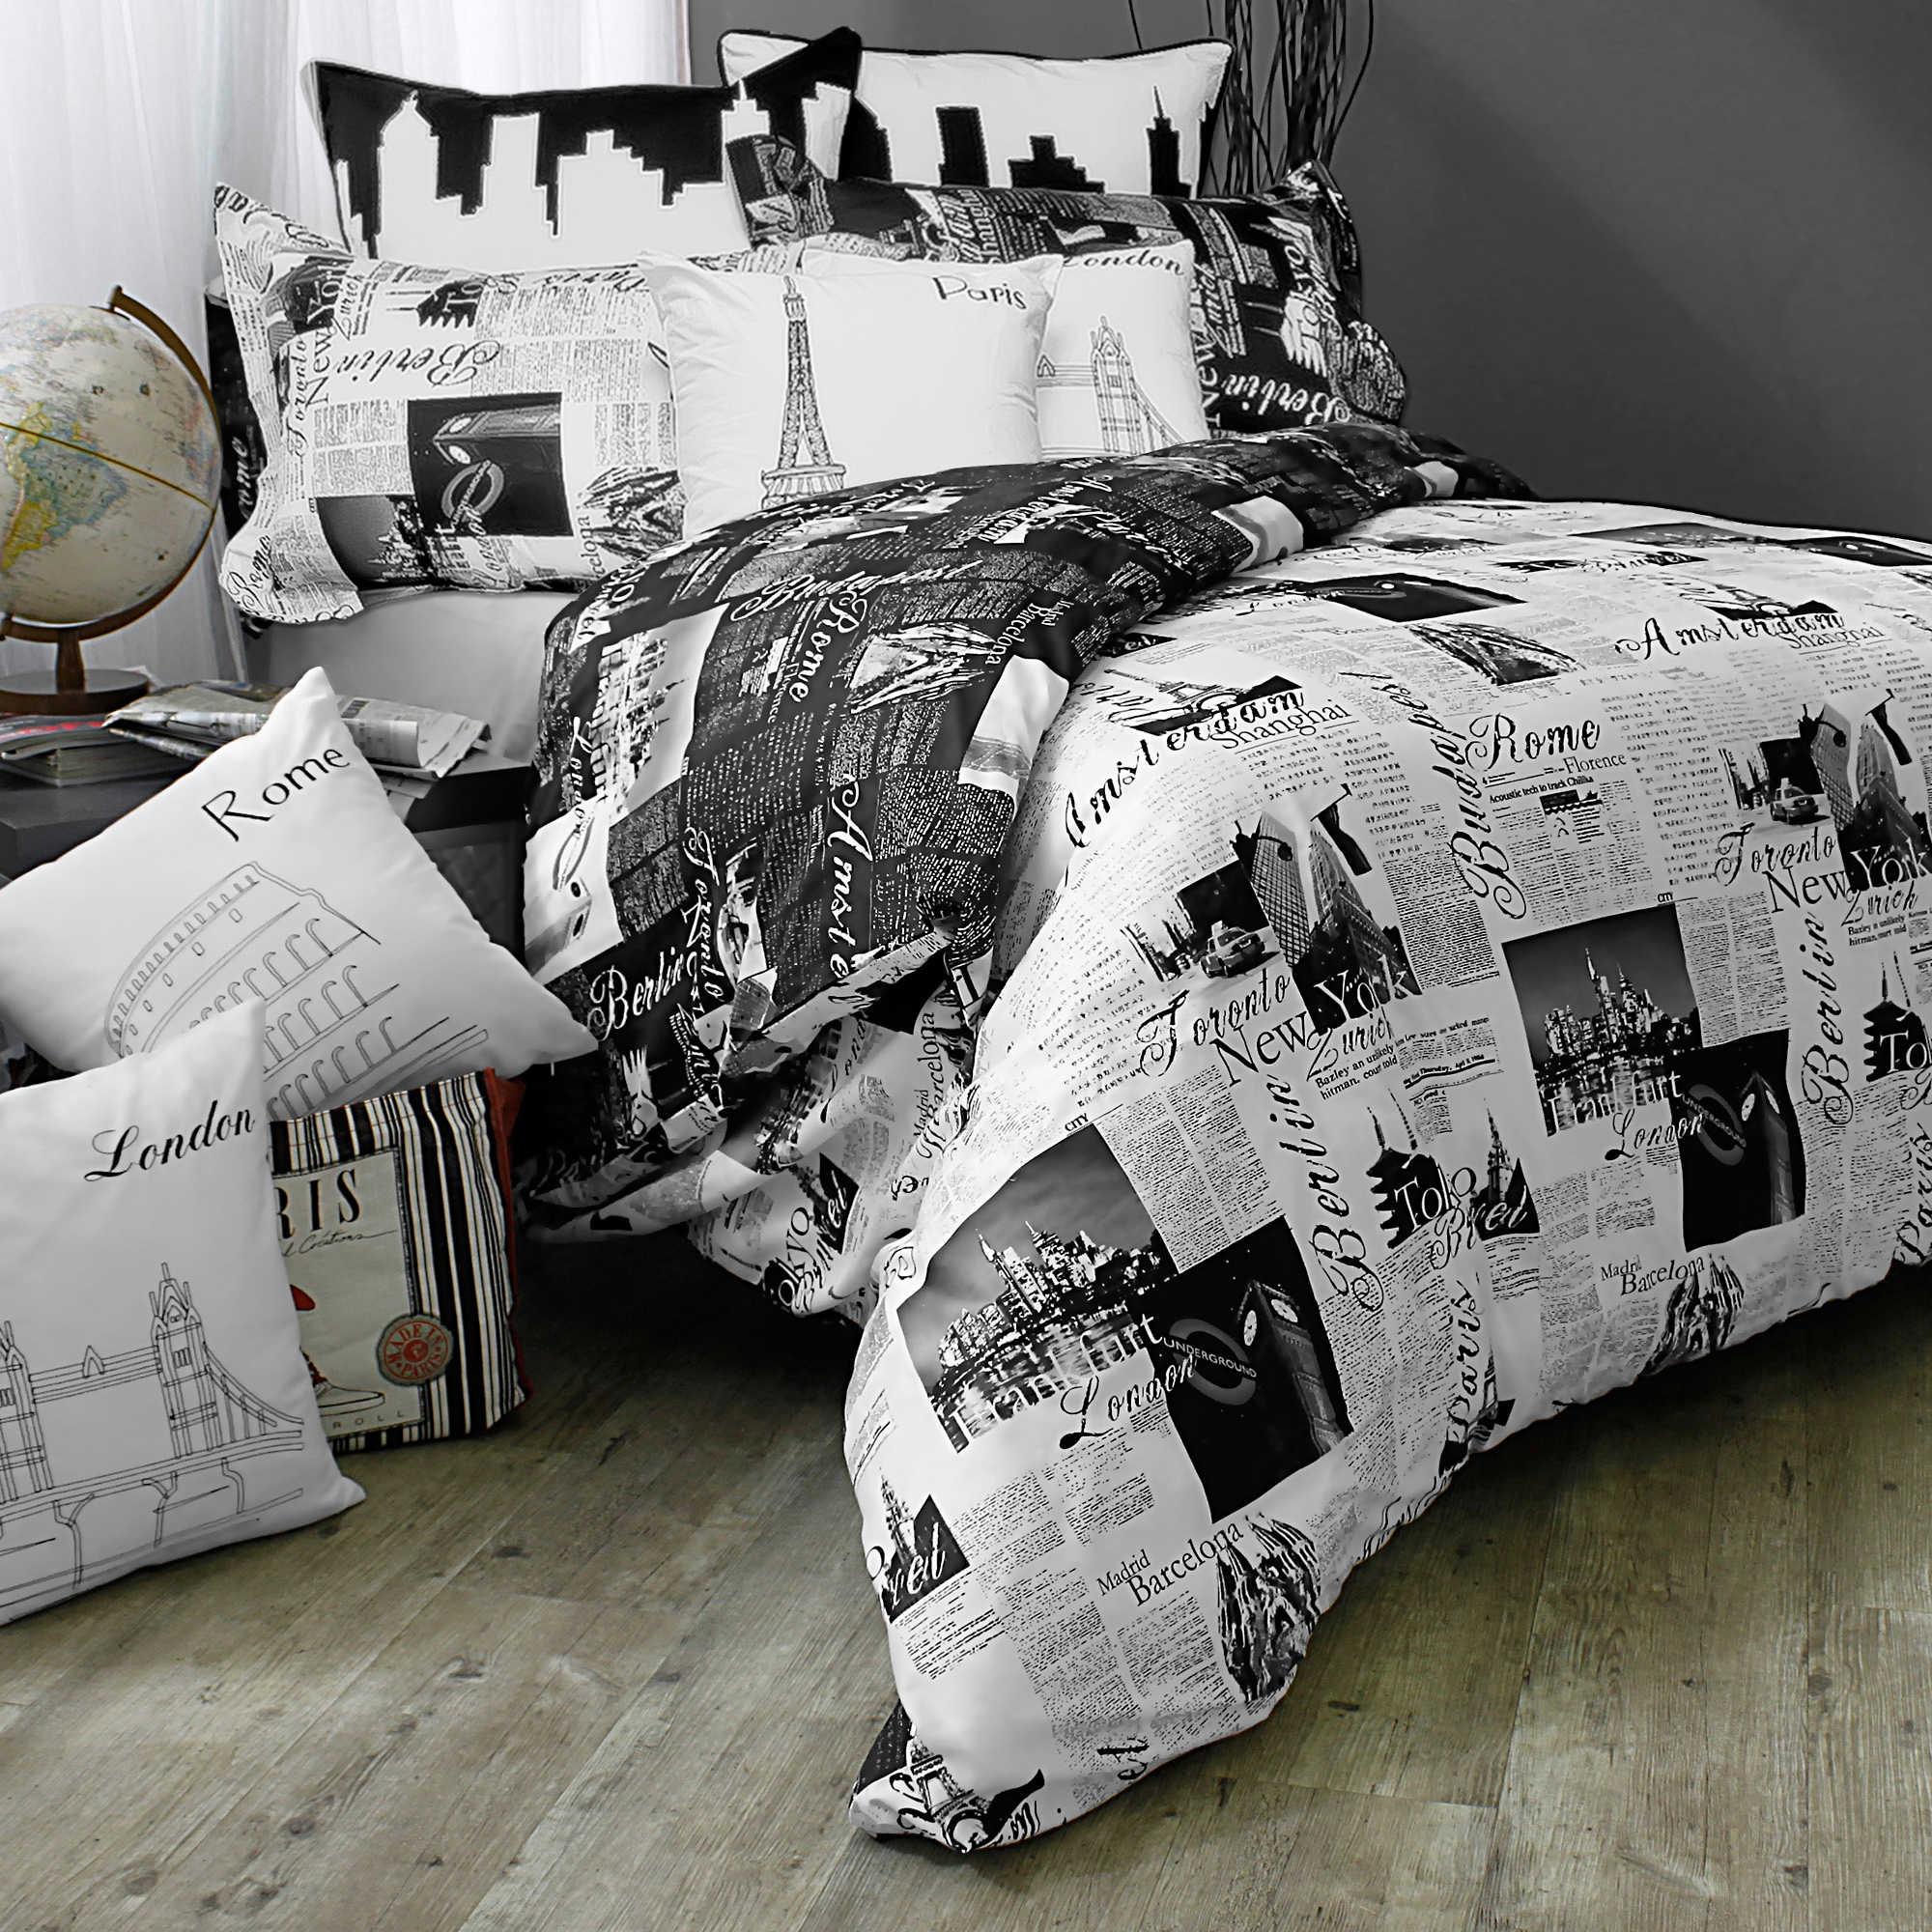 Duvet Cover Sets Bed Bath And Beyond - Sweetgalas